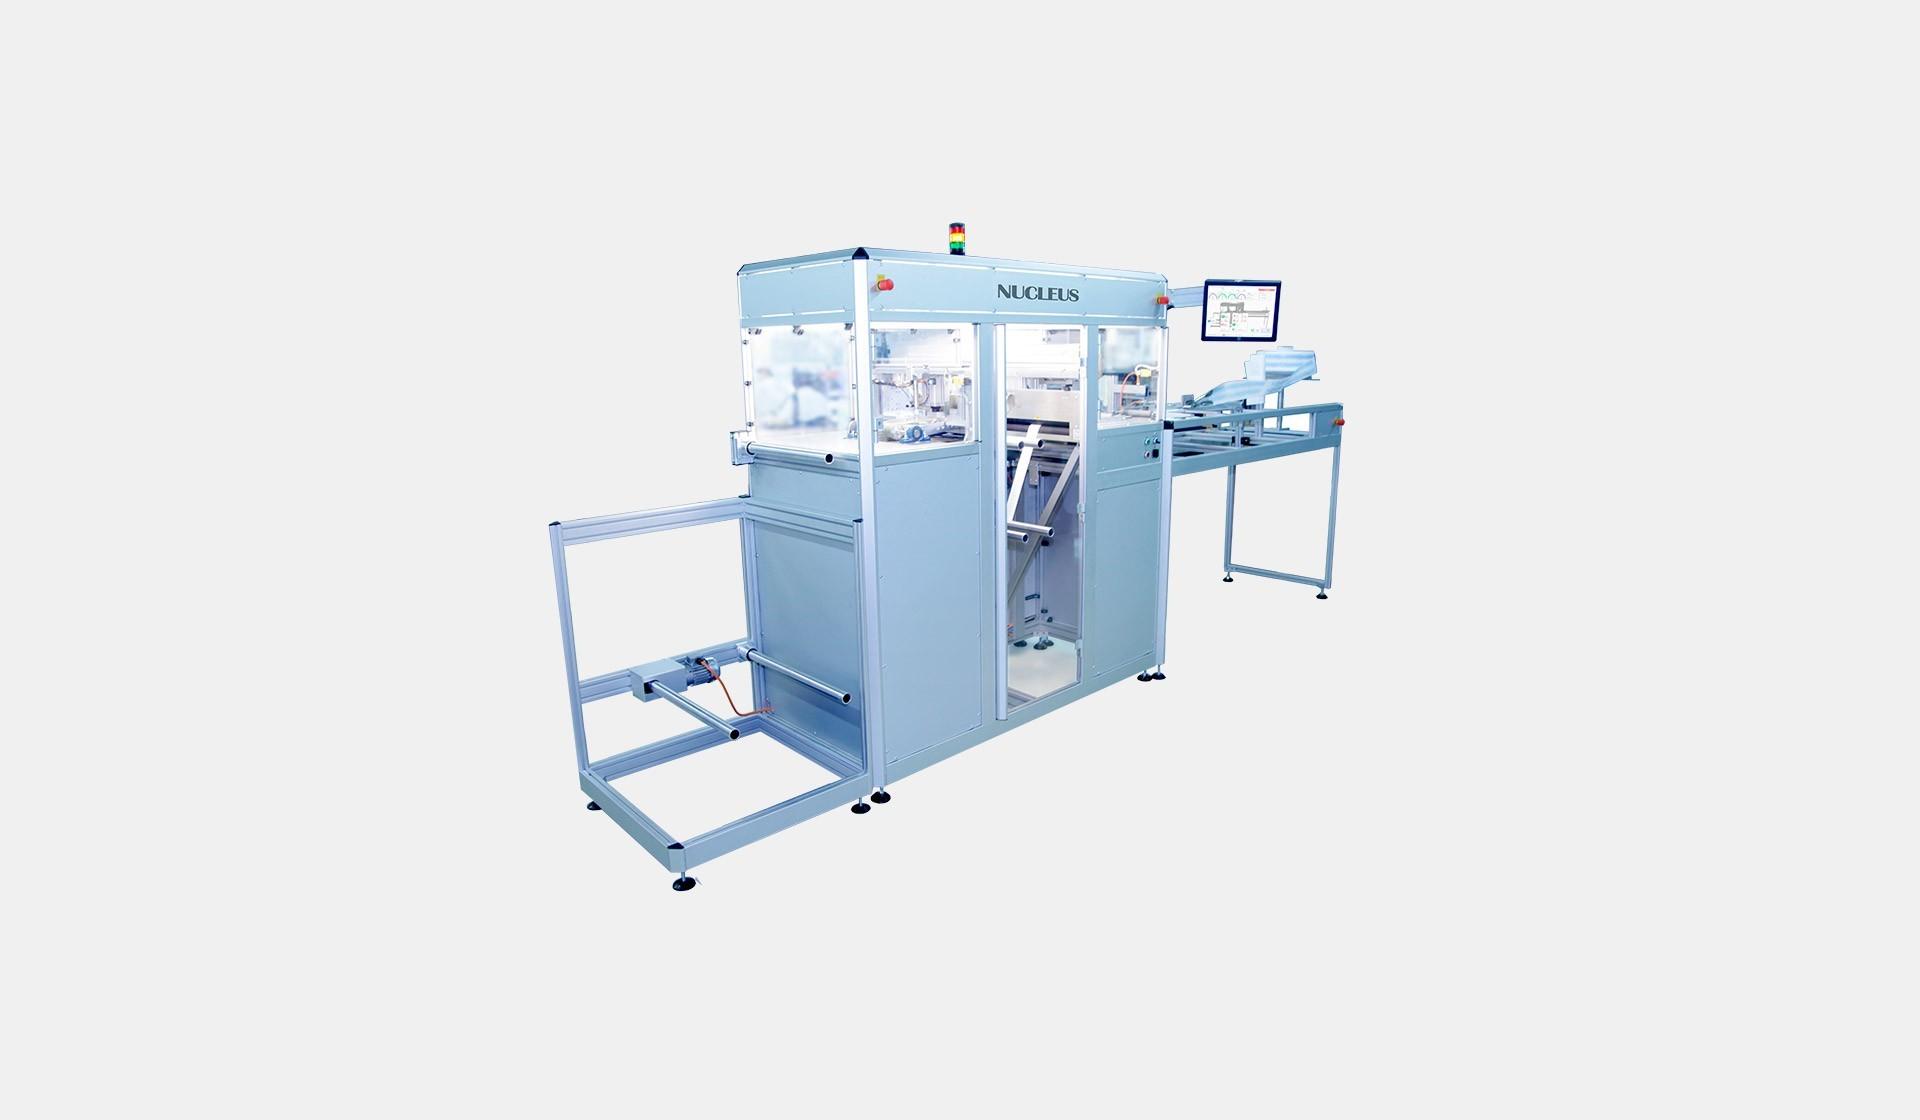 Schlauch-/Beutelproduktionsmaschine